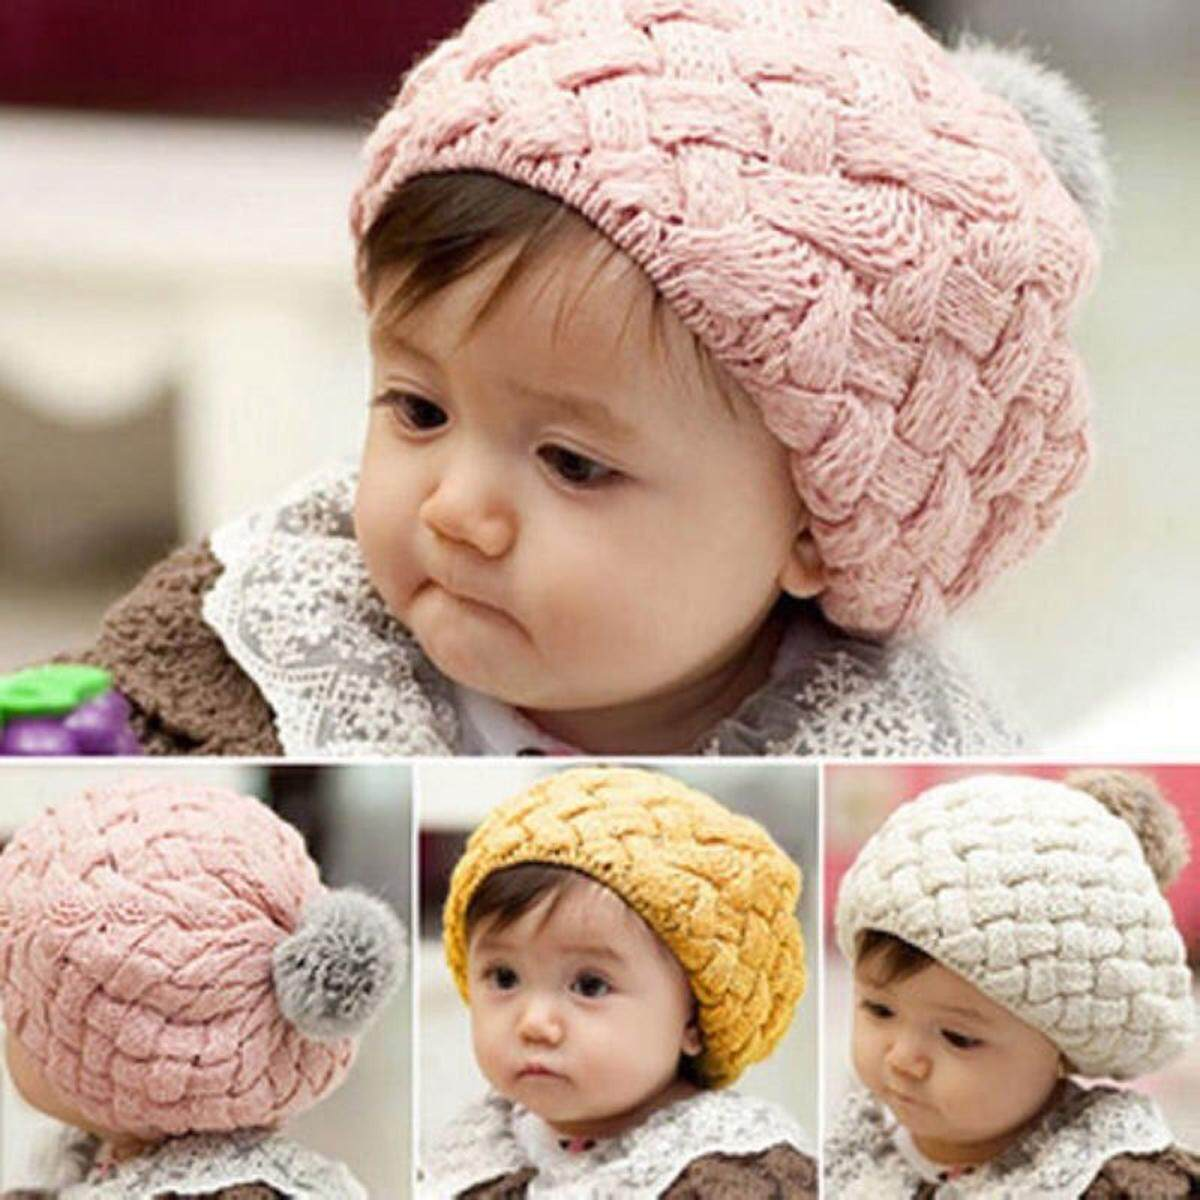 Cute Baby Toddler Kid Boys Girls Knitted Crochet Soft Warm Beanie Winter Hat Cap